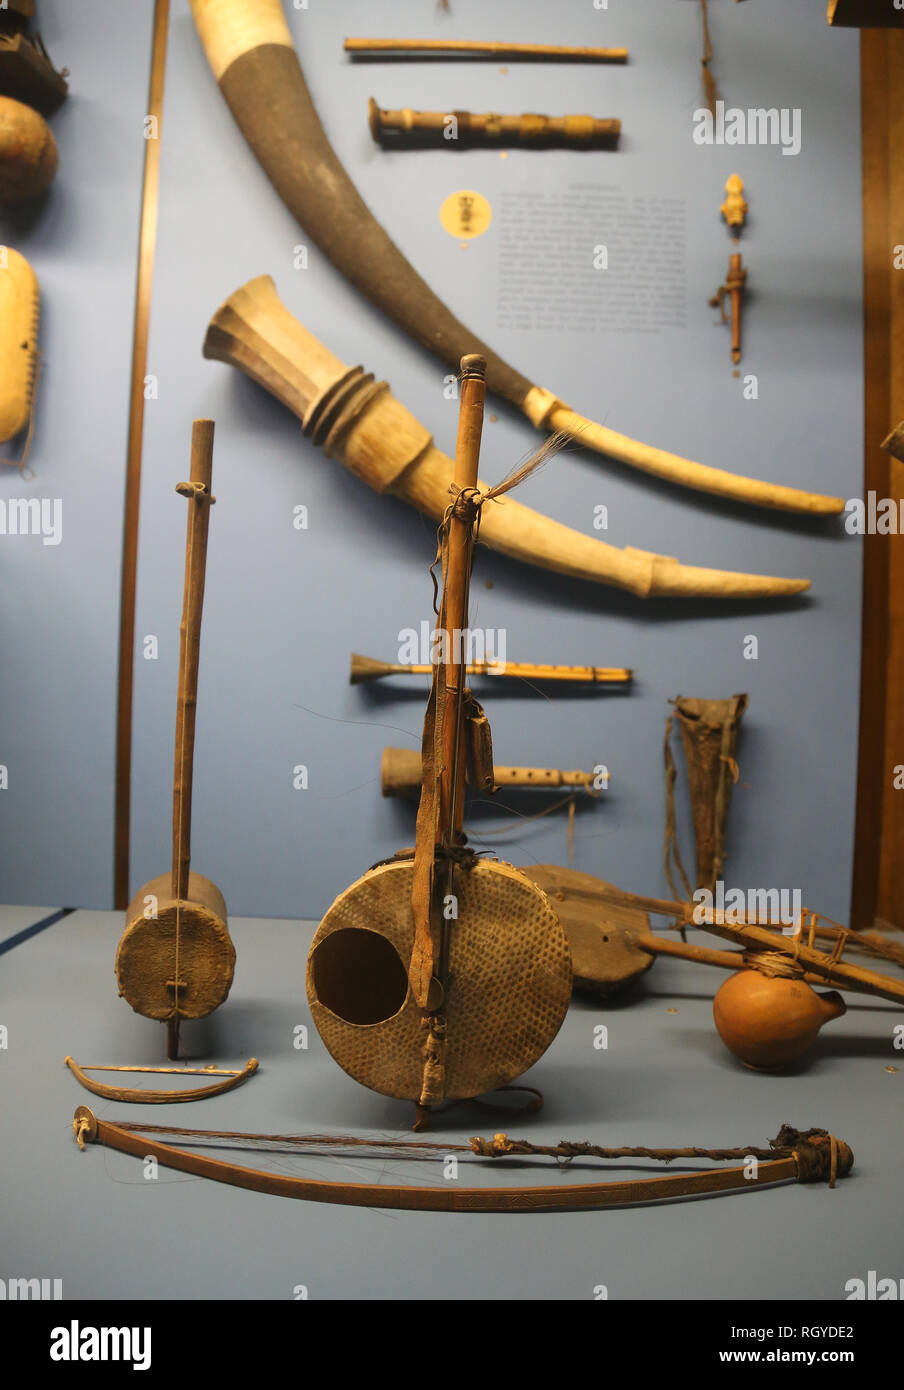 L'Afrique. Instruments musicaux. American Museum of Natural History. New York. États-unis. Photo Stock